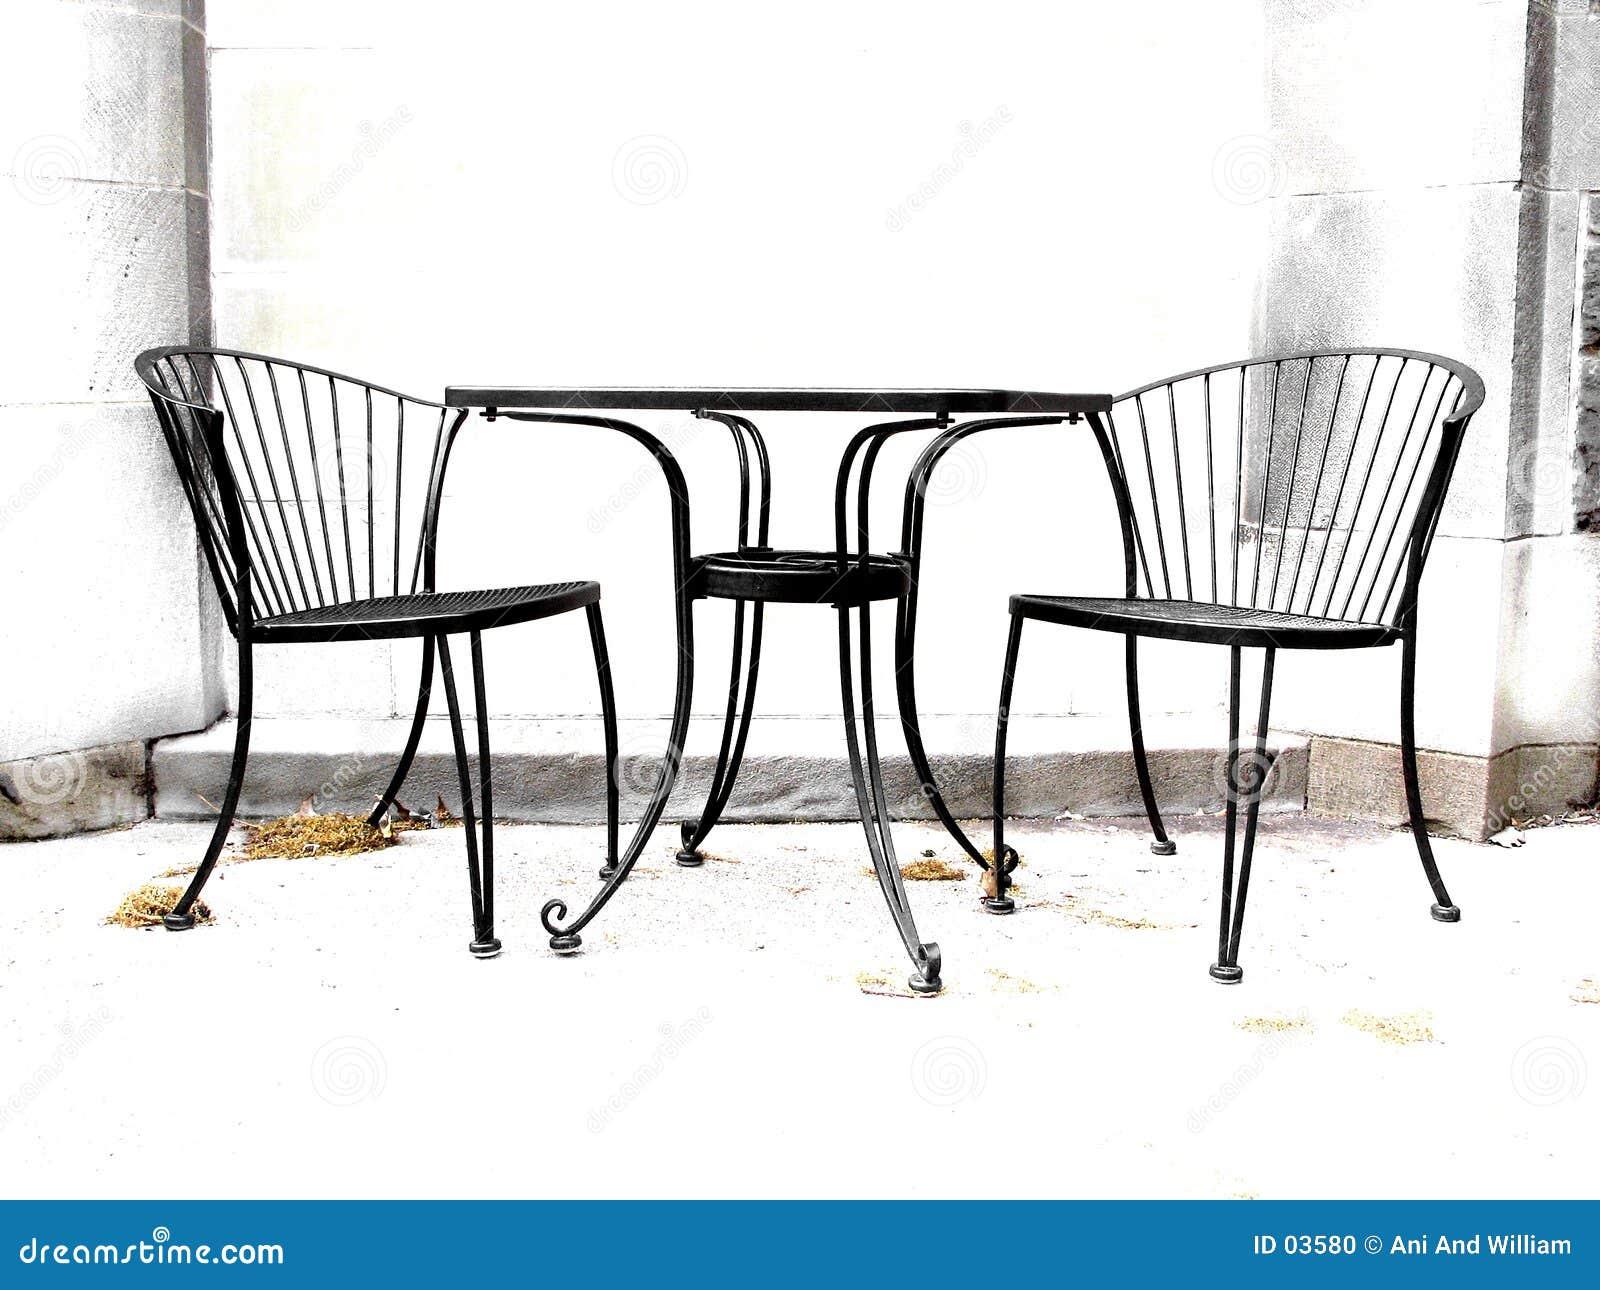 椅子对比高